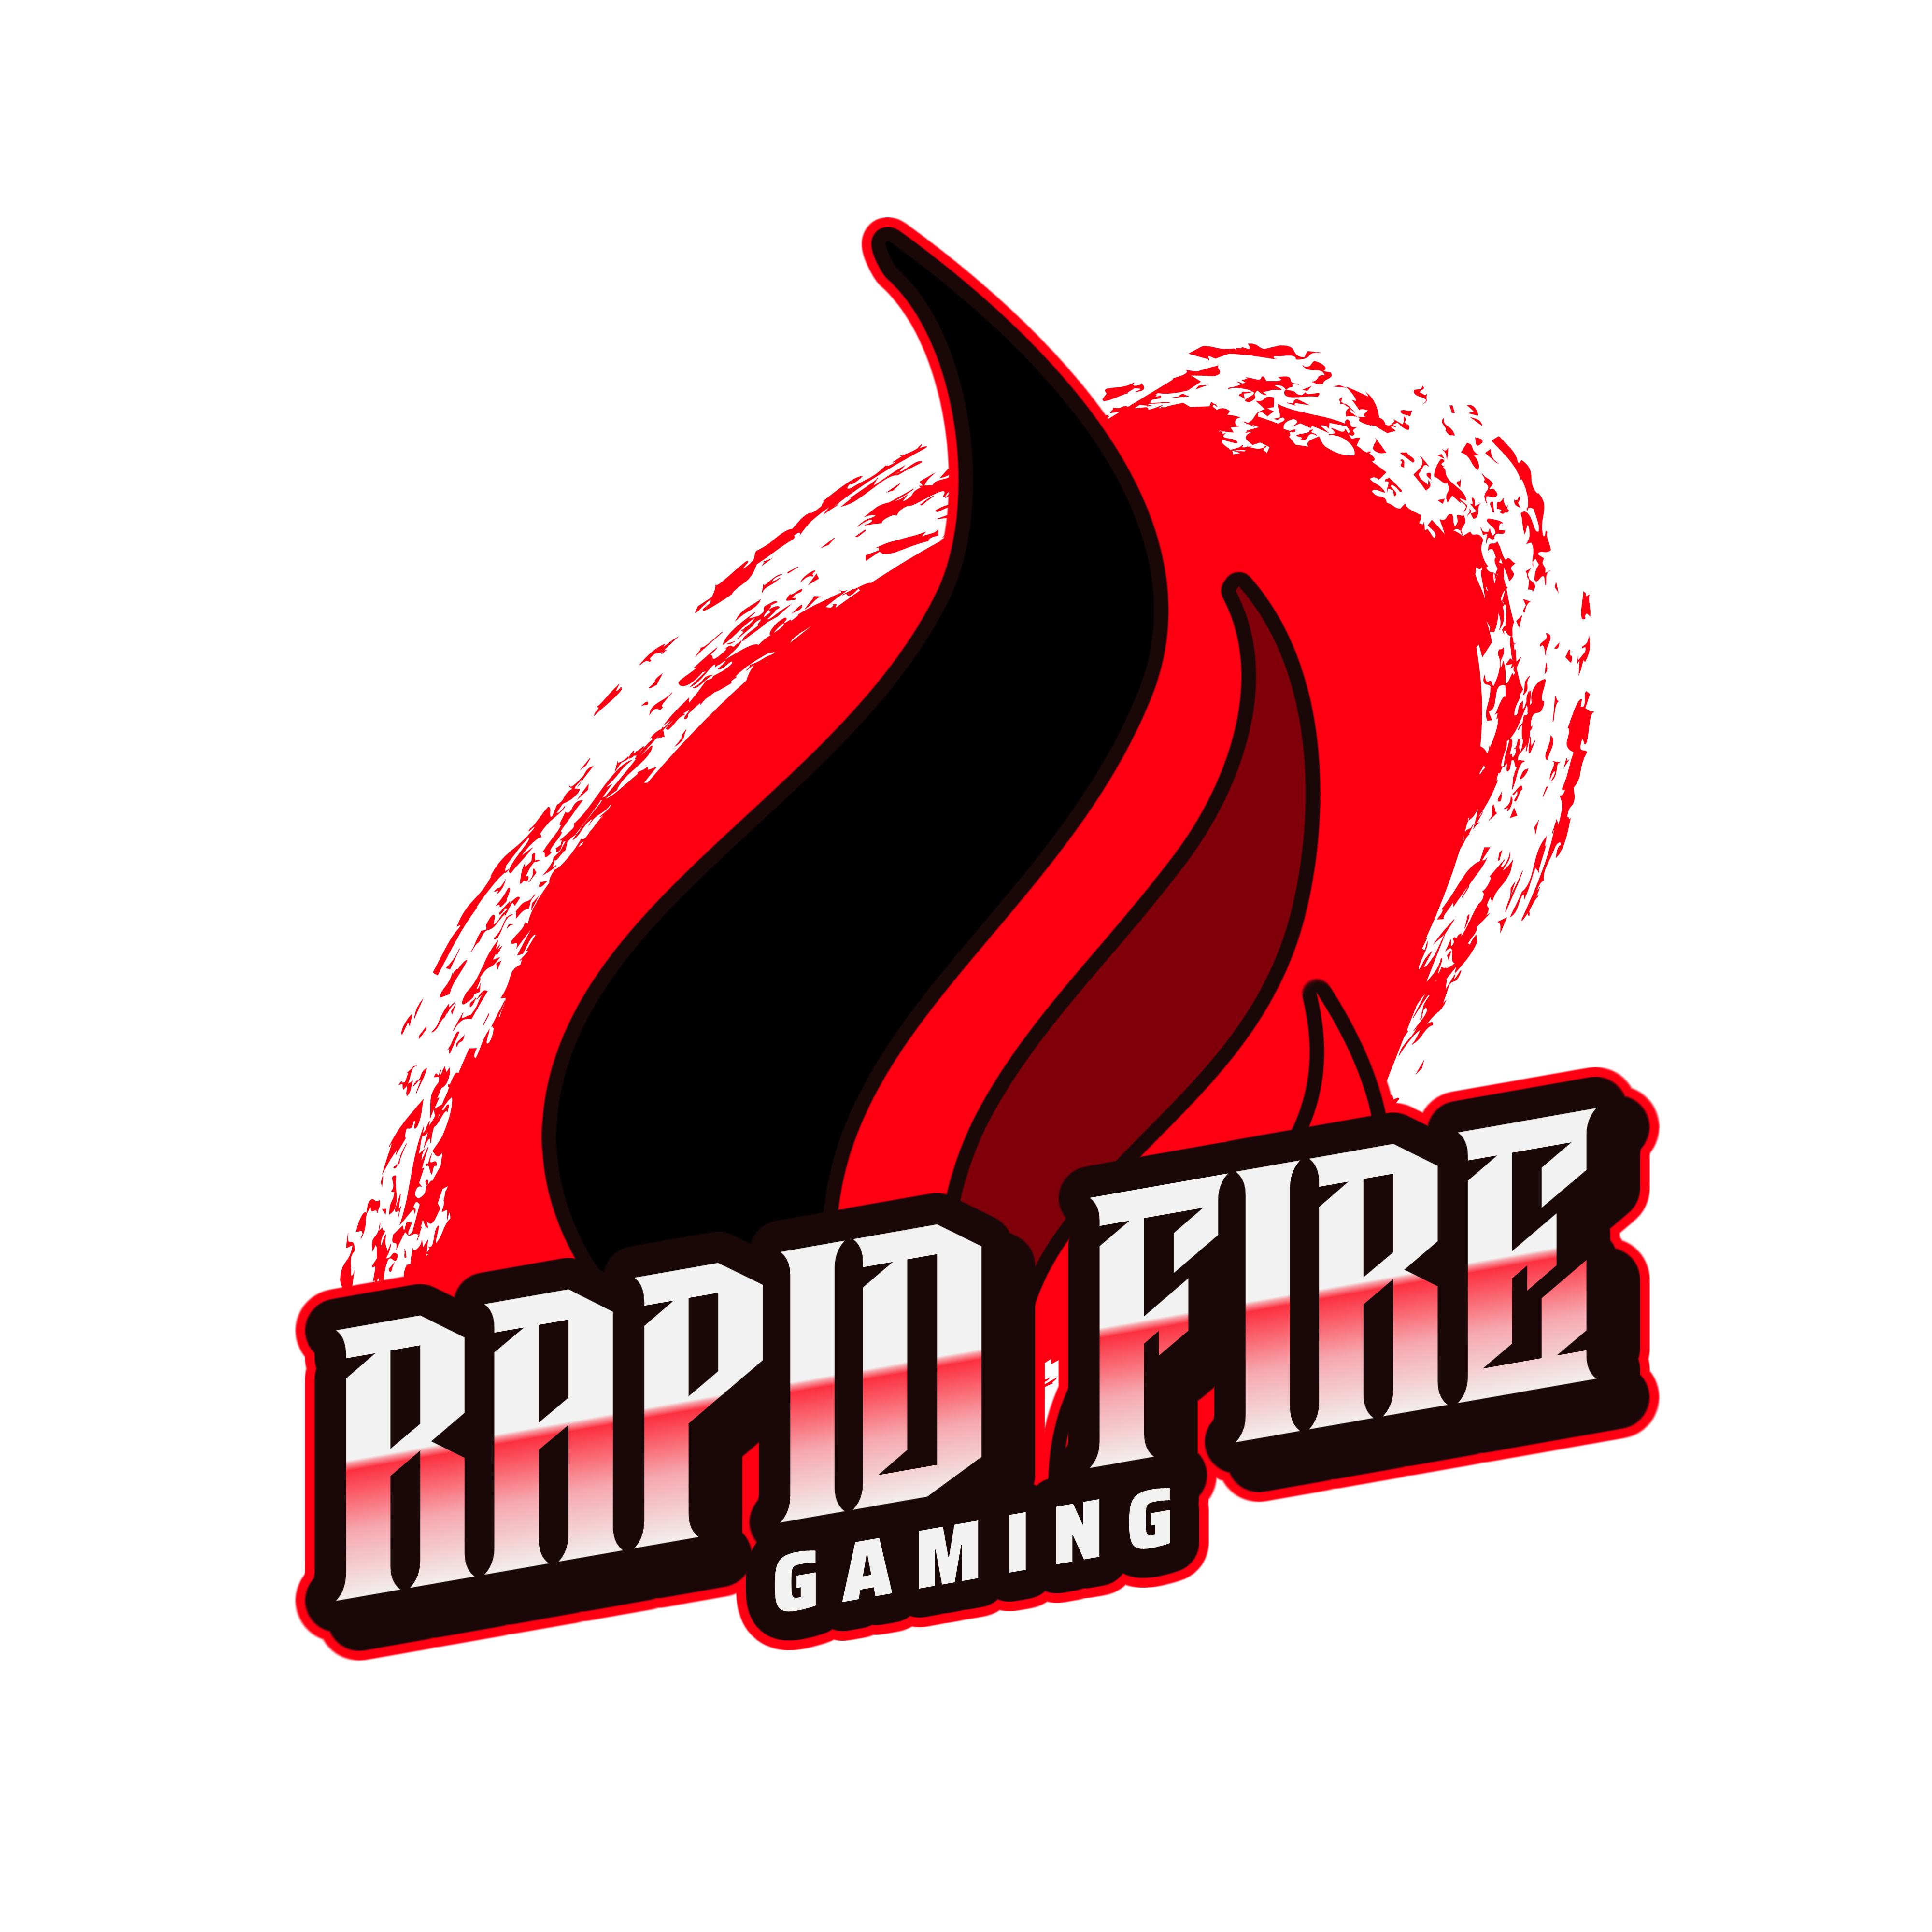 Background Rapid Fire Test designs